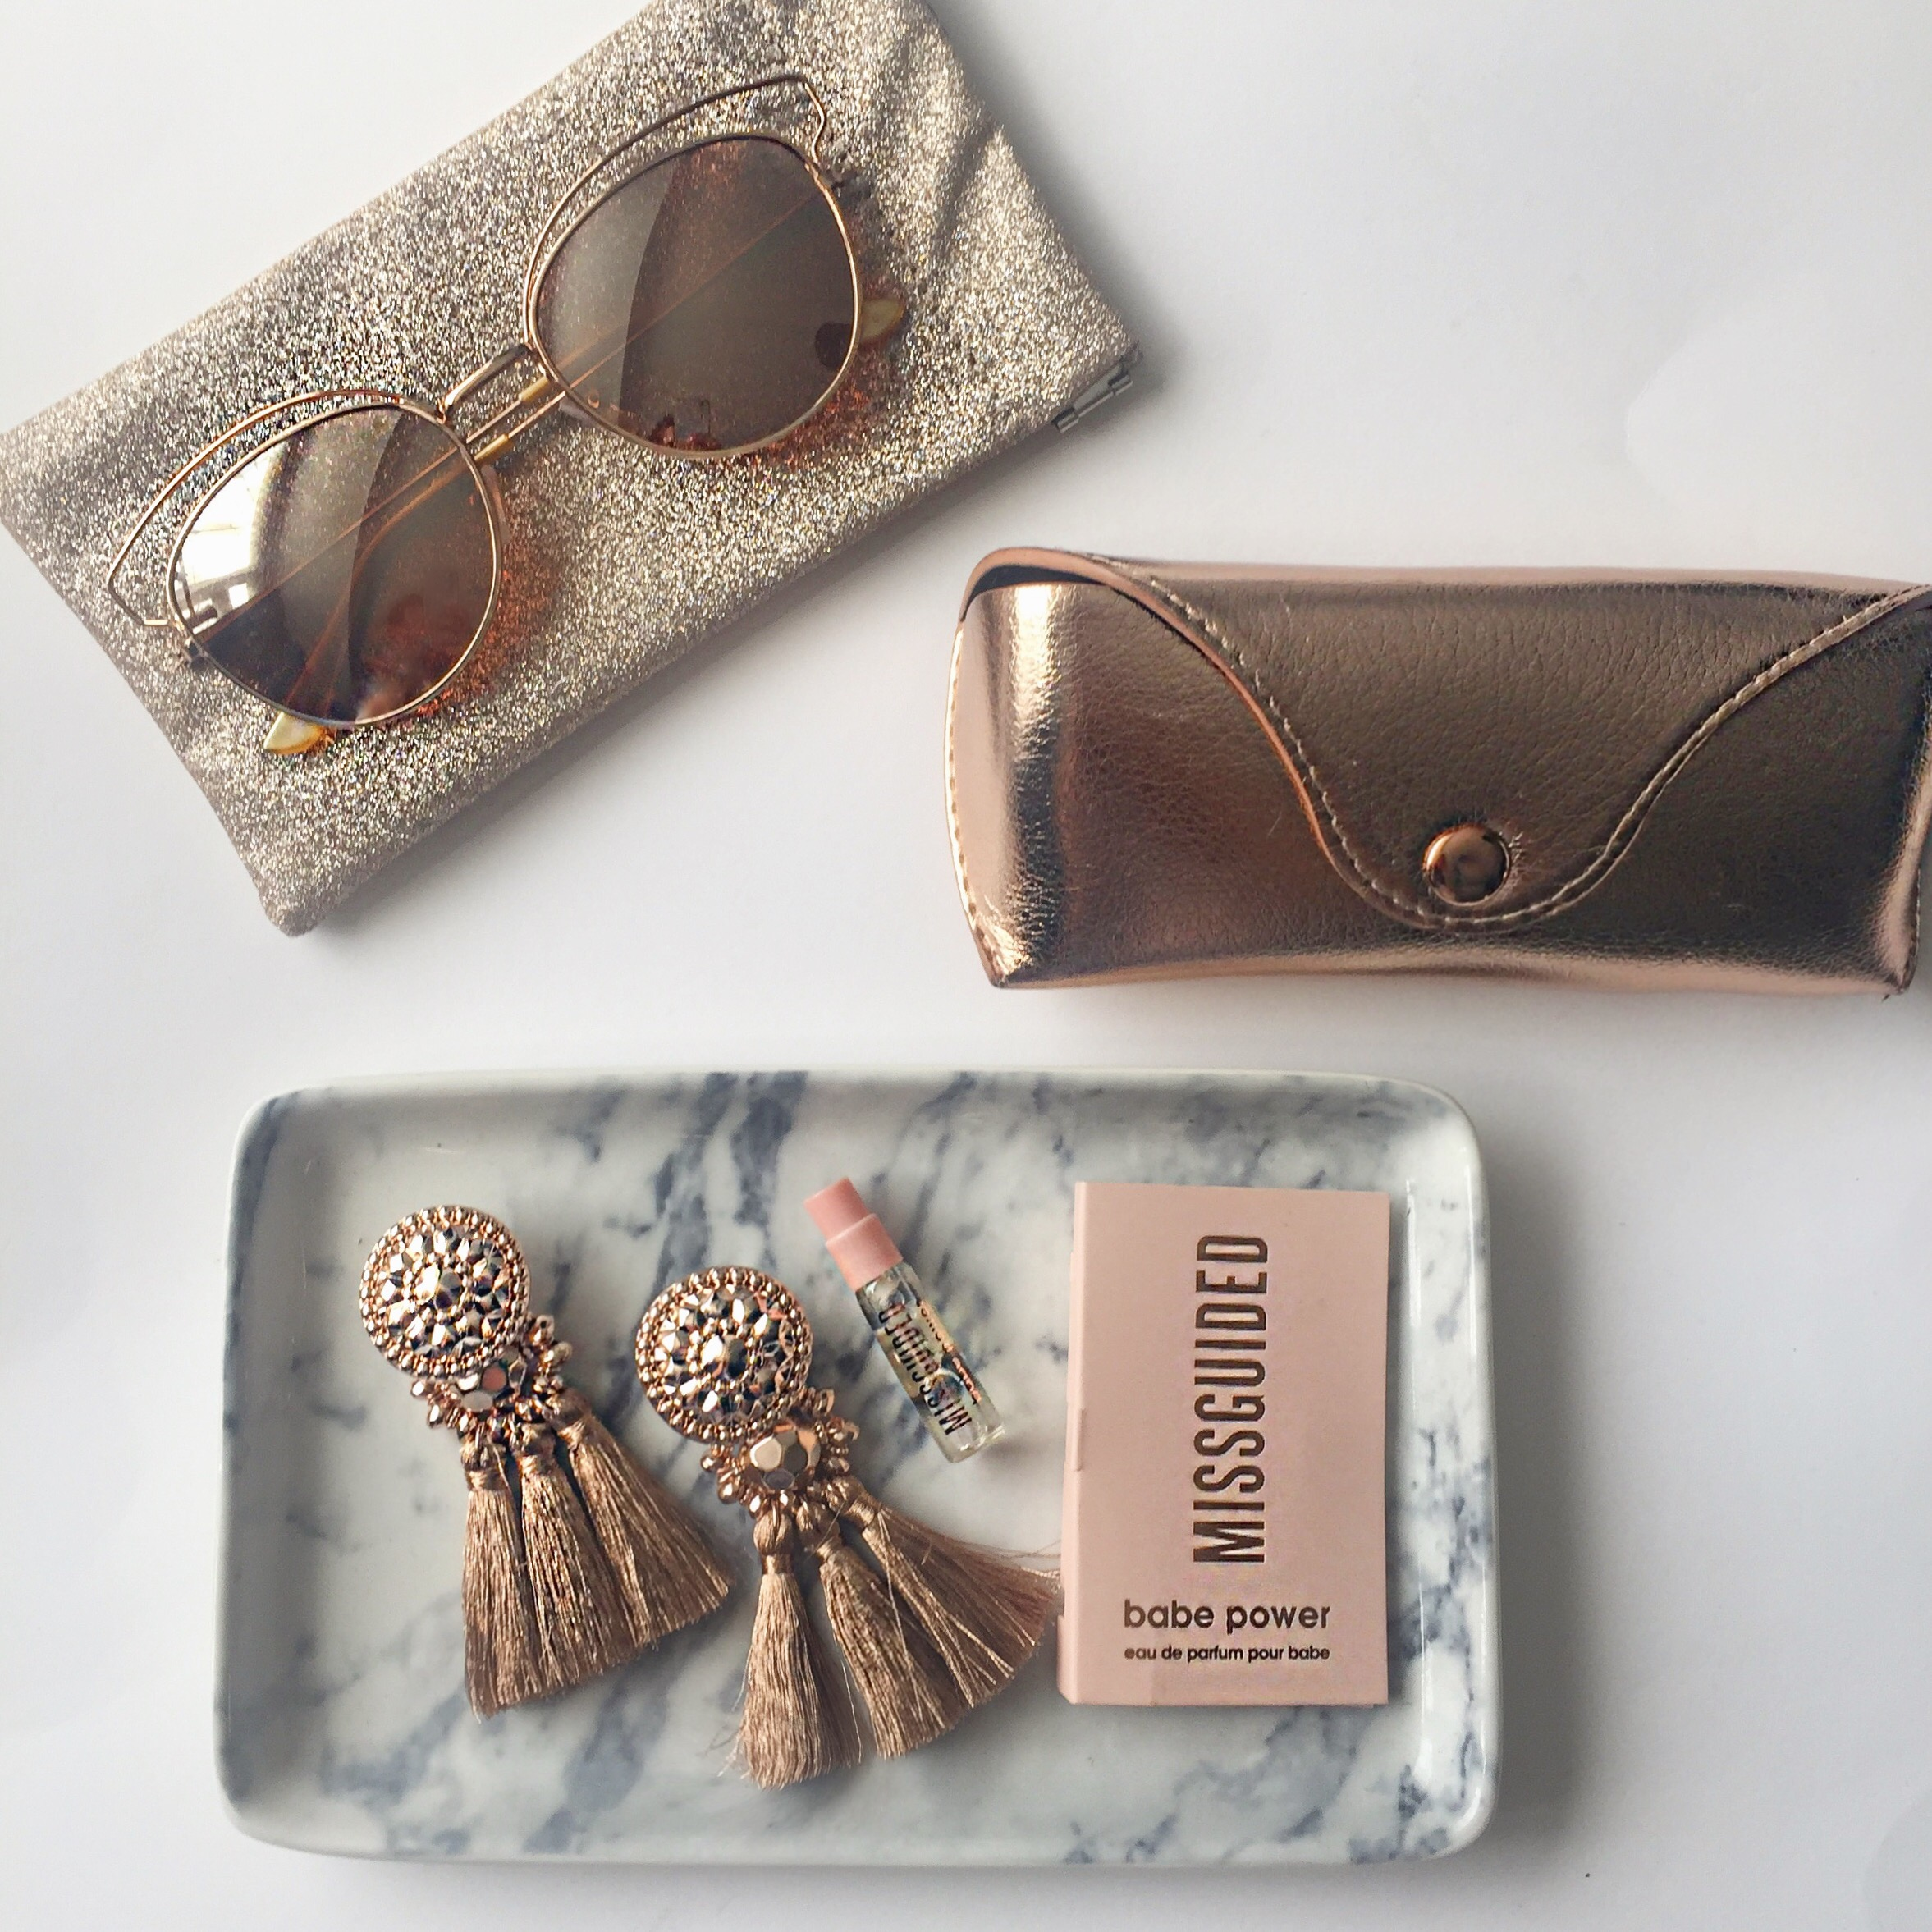 089a8fc032 Sunglasses case – £2/Primark Hard Sunglasses case – £3/Primark